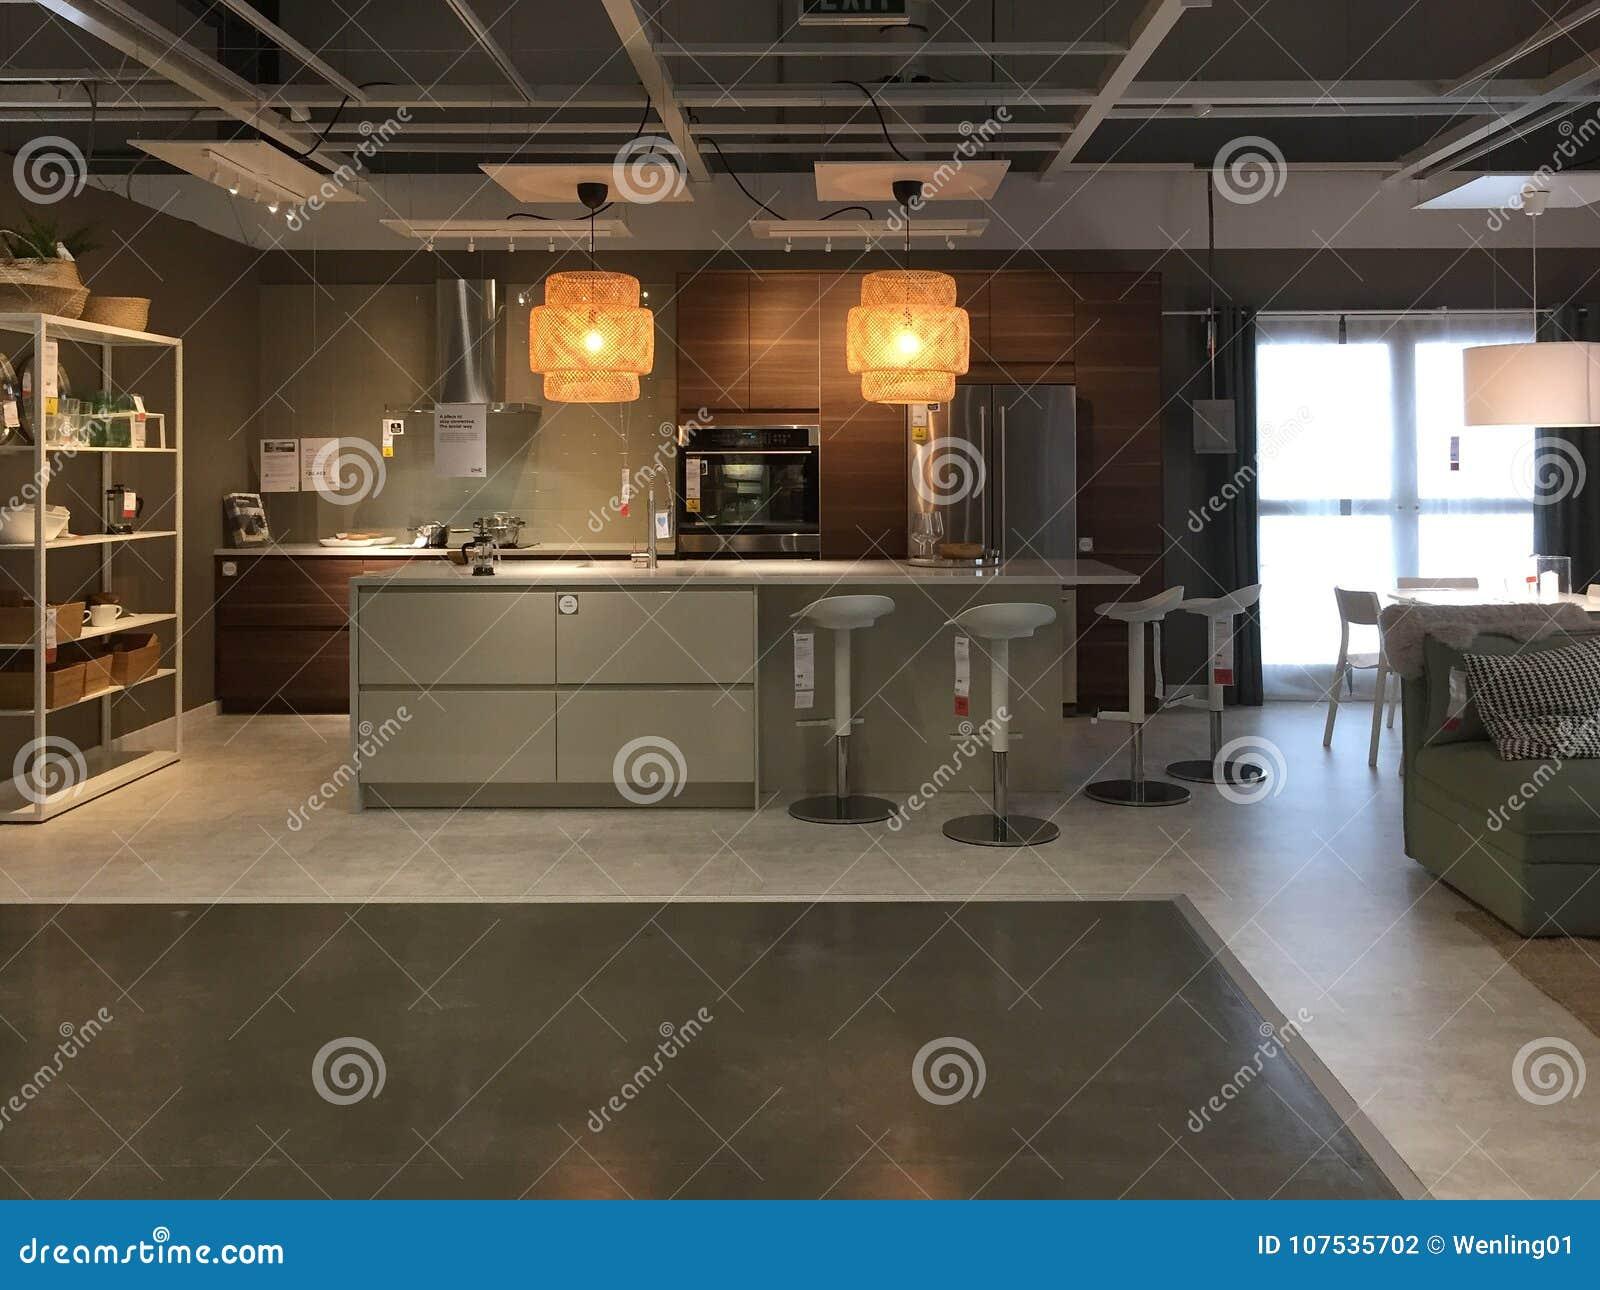 Hermosa Ikea Cocina 3d Planificador De Mac Patrón - Ideas para ...